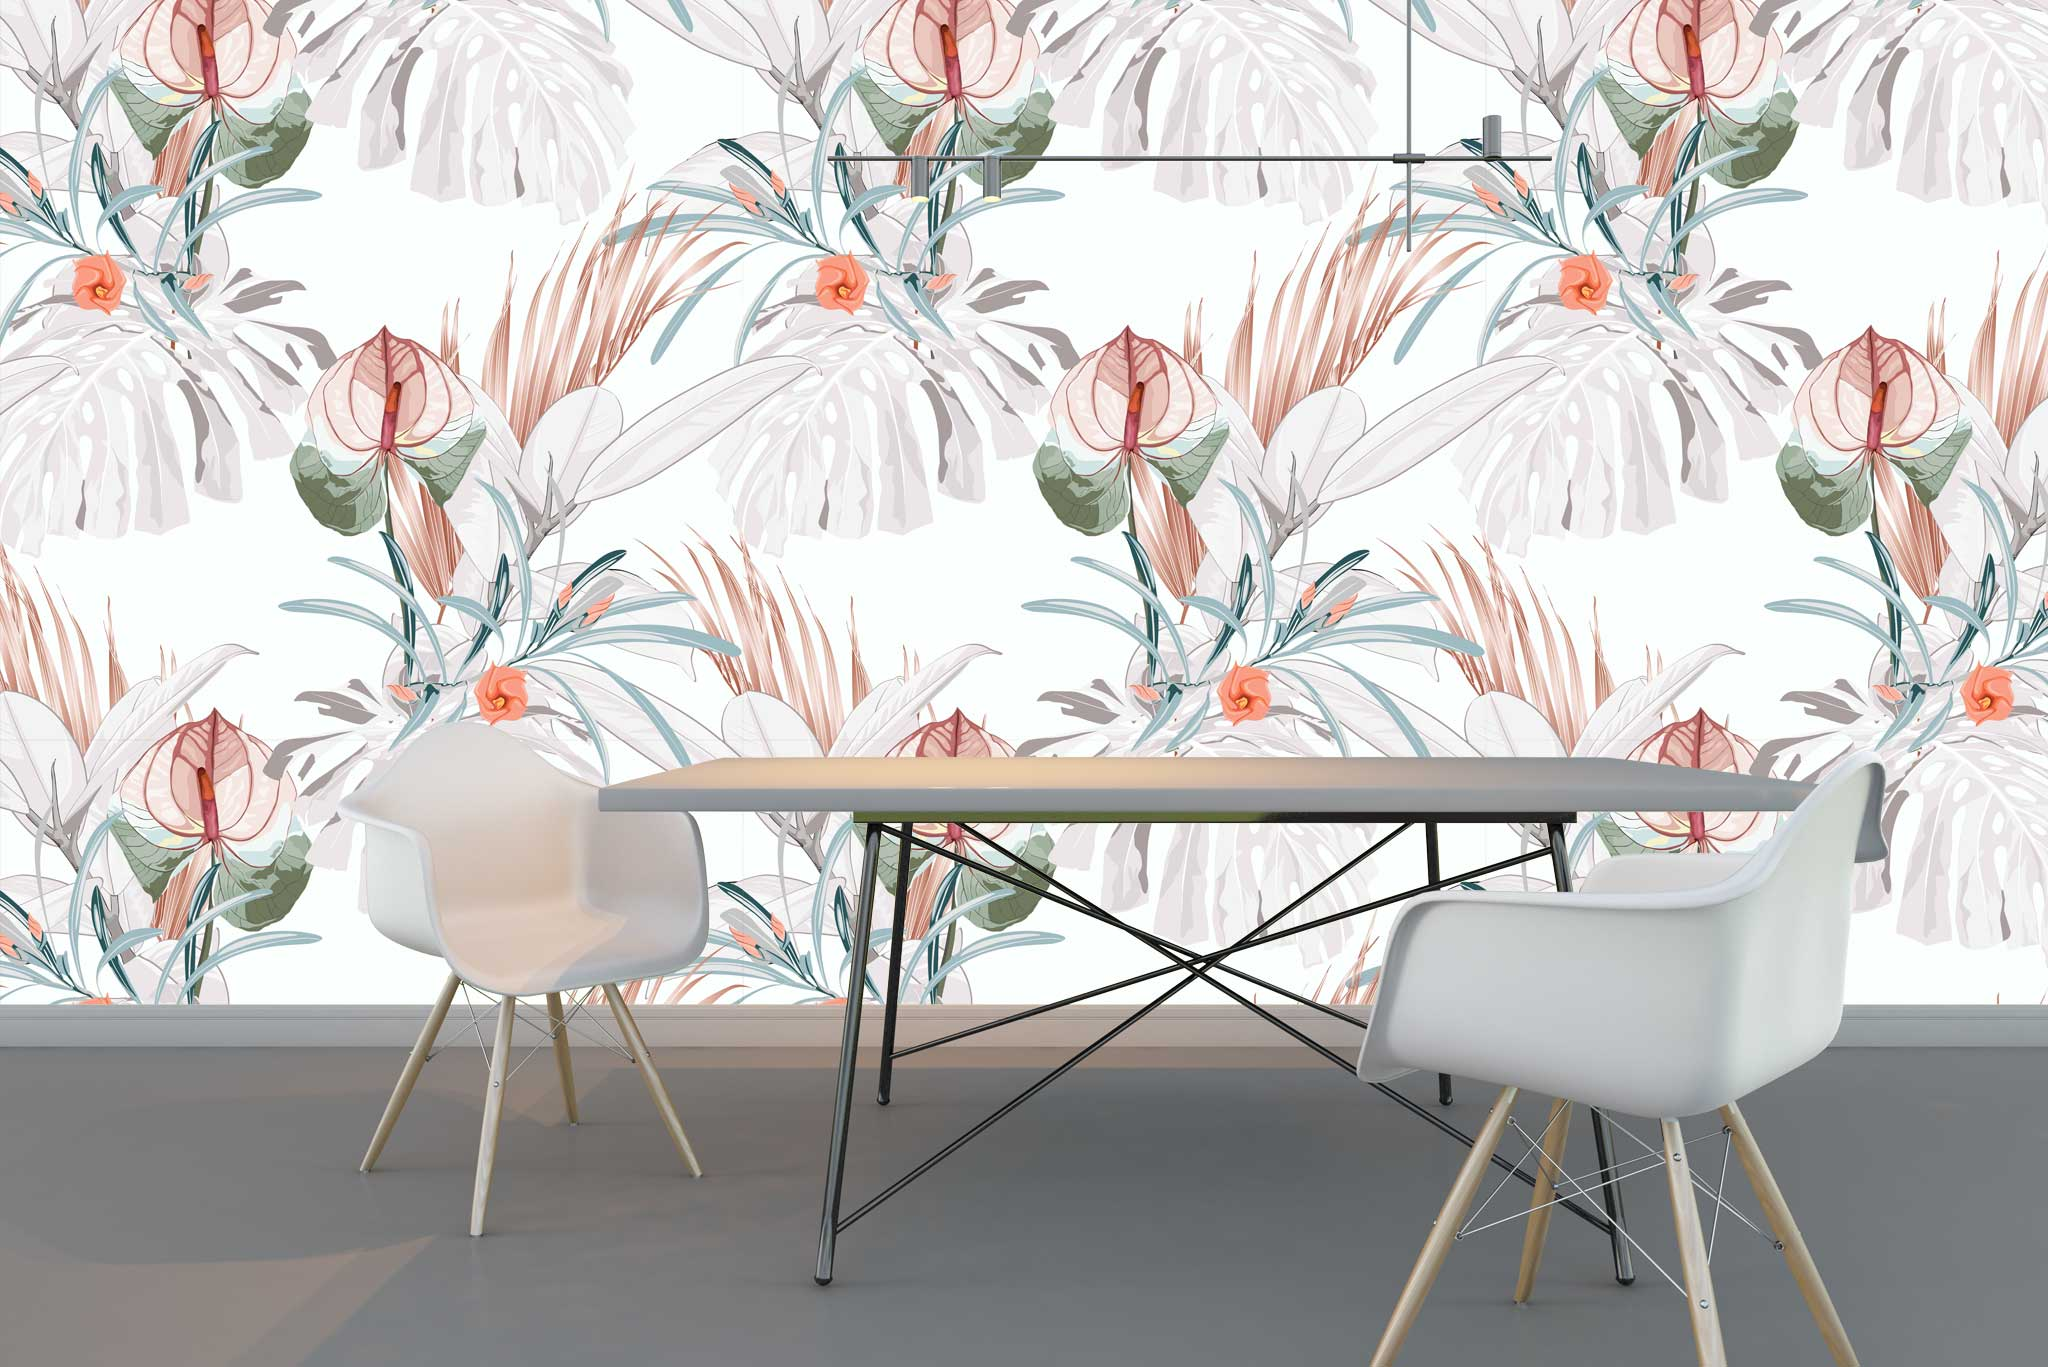 tapet-fototapet-comanda-personalizat-bucuresti-perete-special-lux-model-vegetal-frunze-flori-exotice-tropical-alb